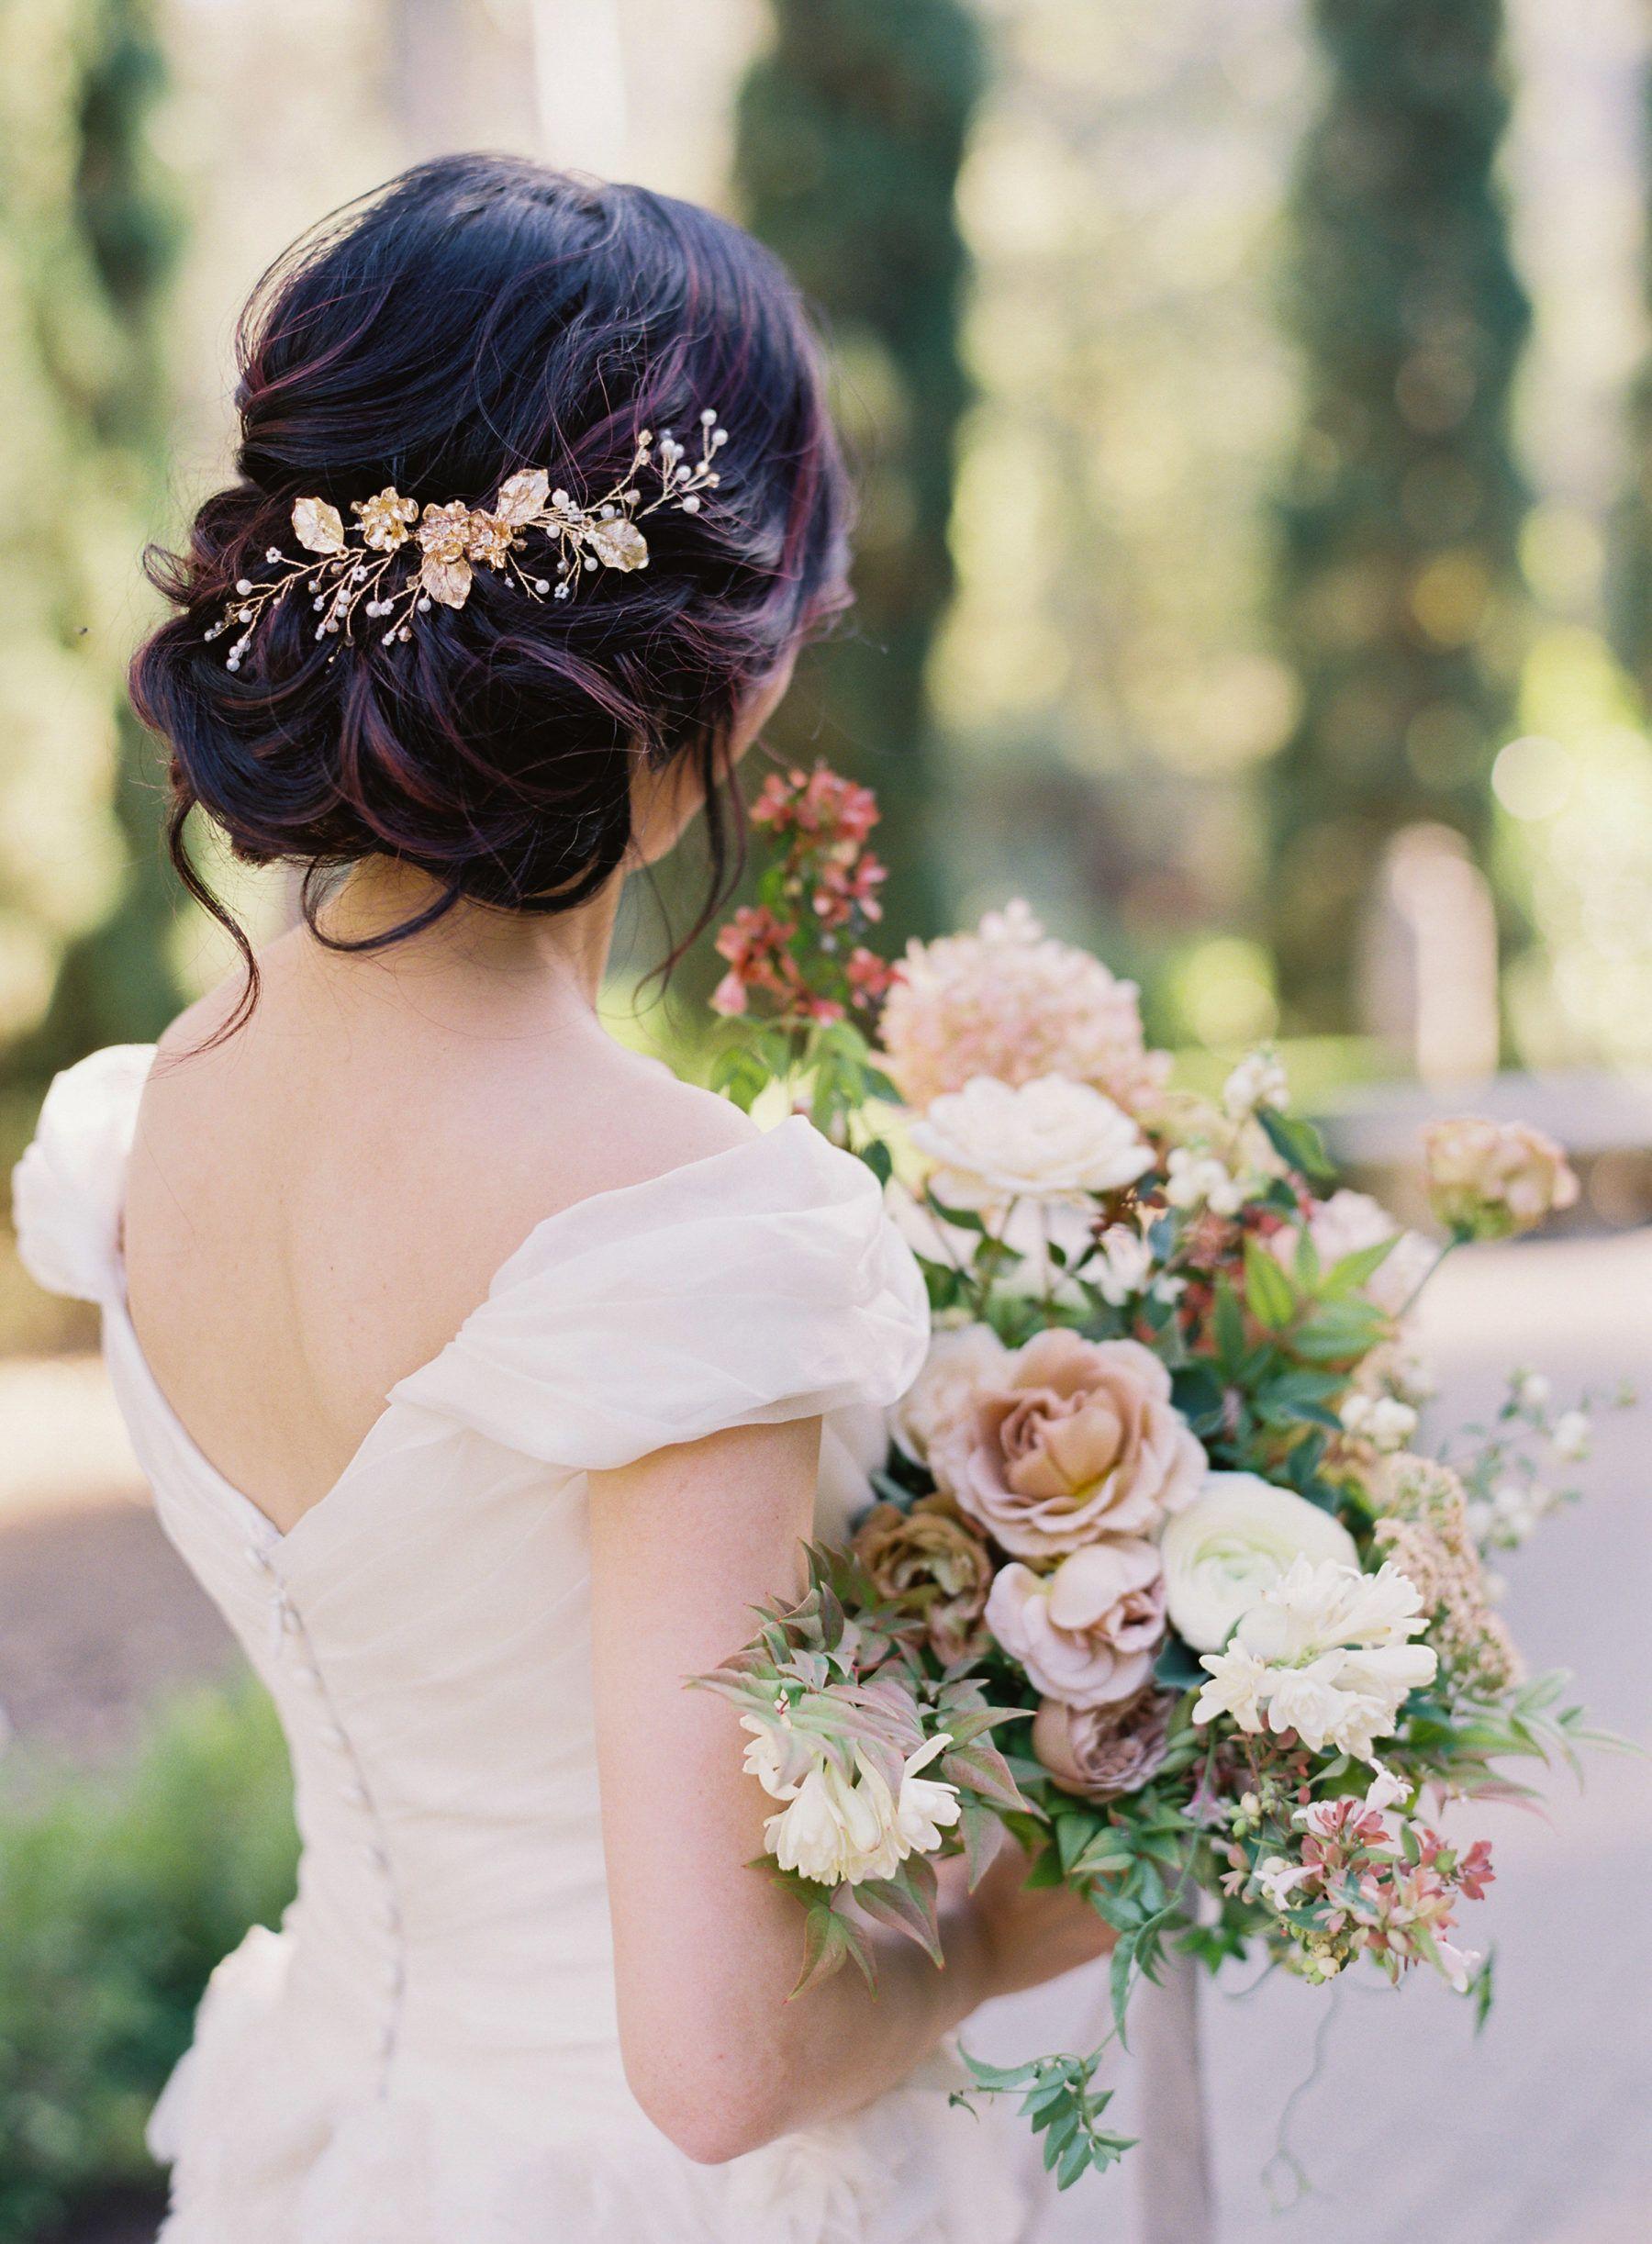 italian-inspired wedding with autumn hues at villa montalvo